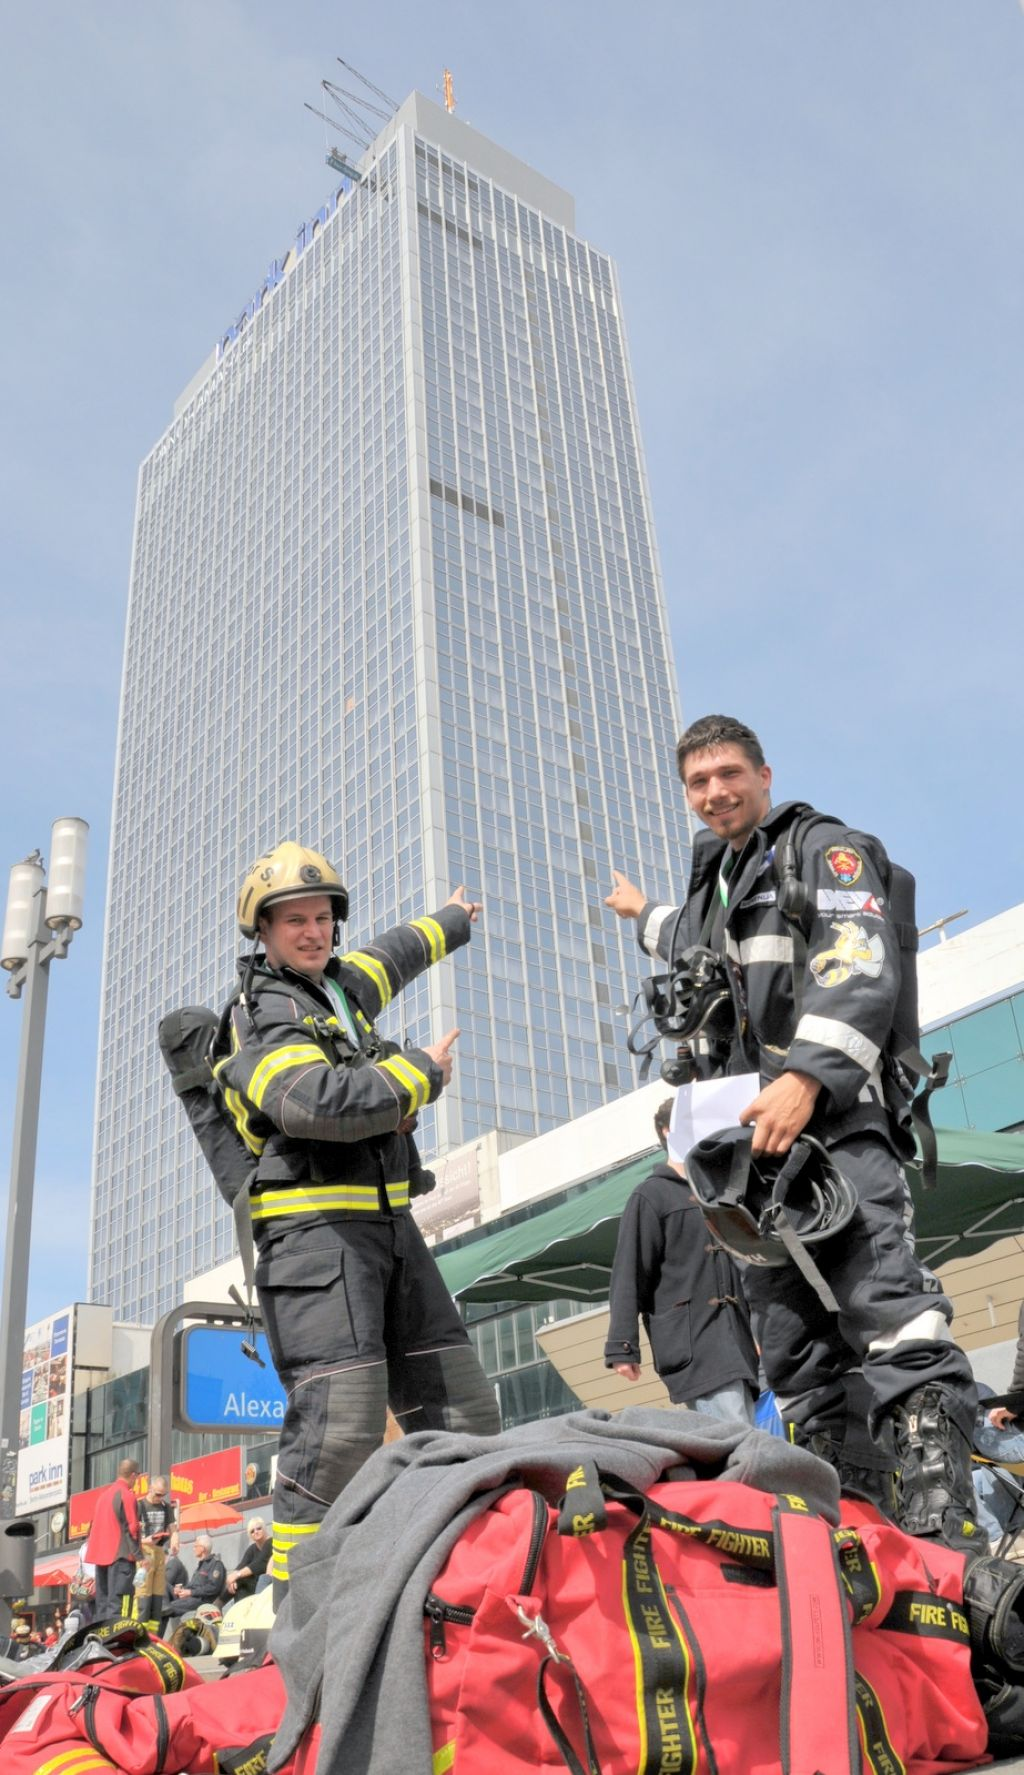 Izziv za najbolj trenirane gasilce